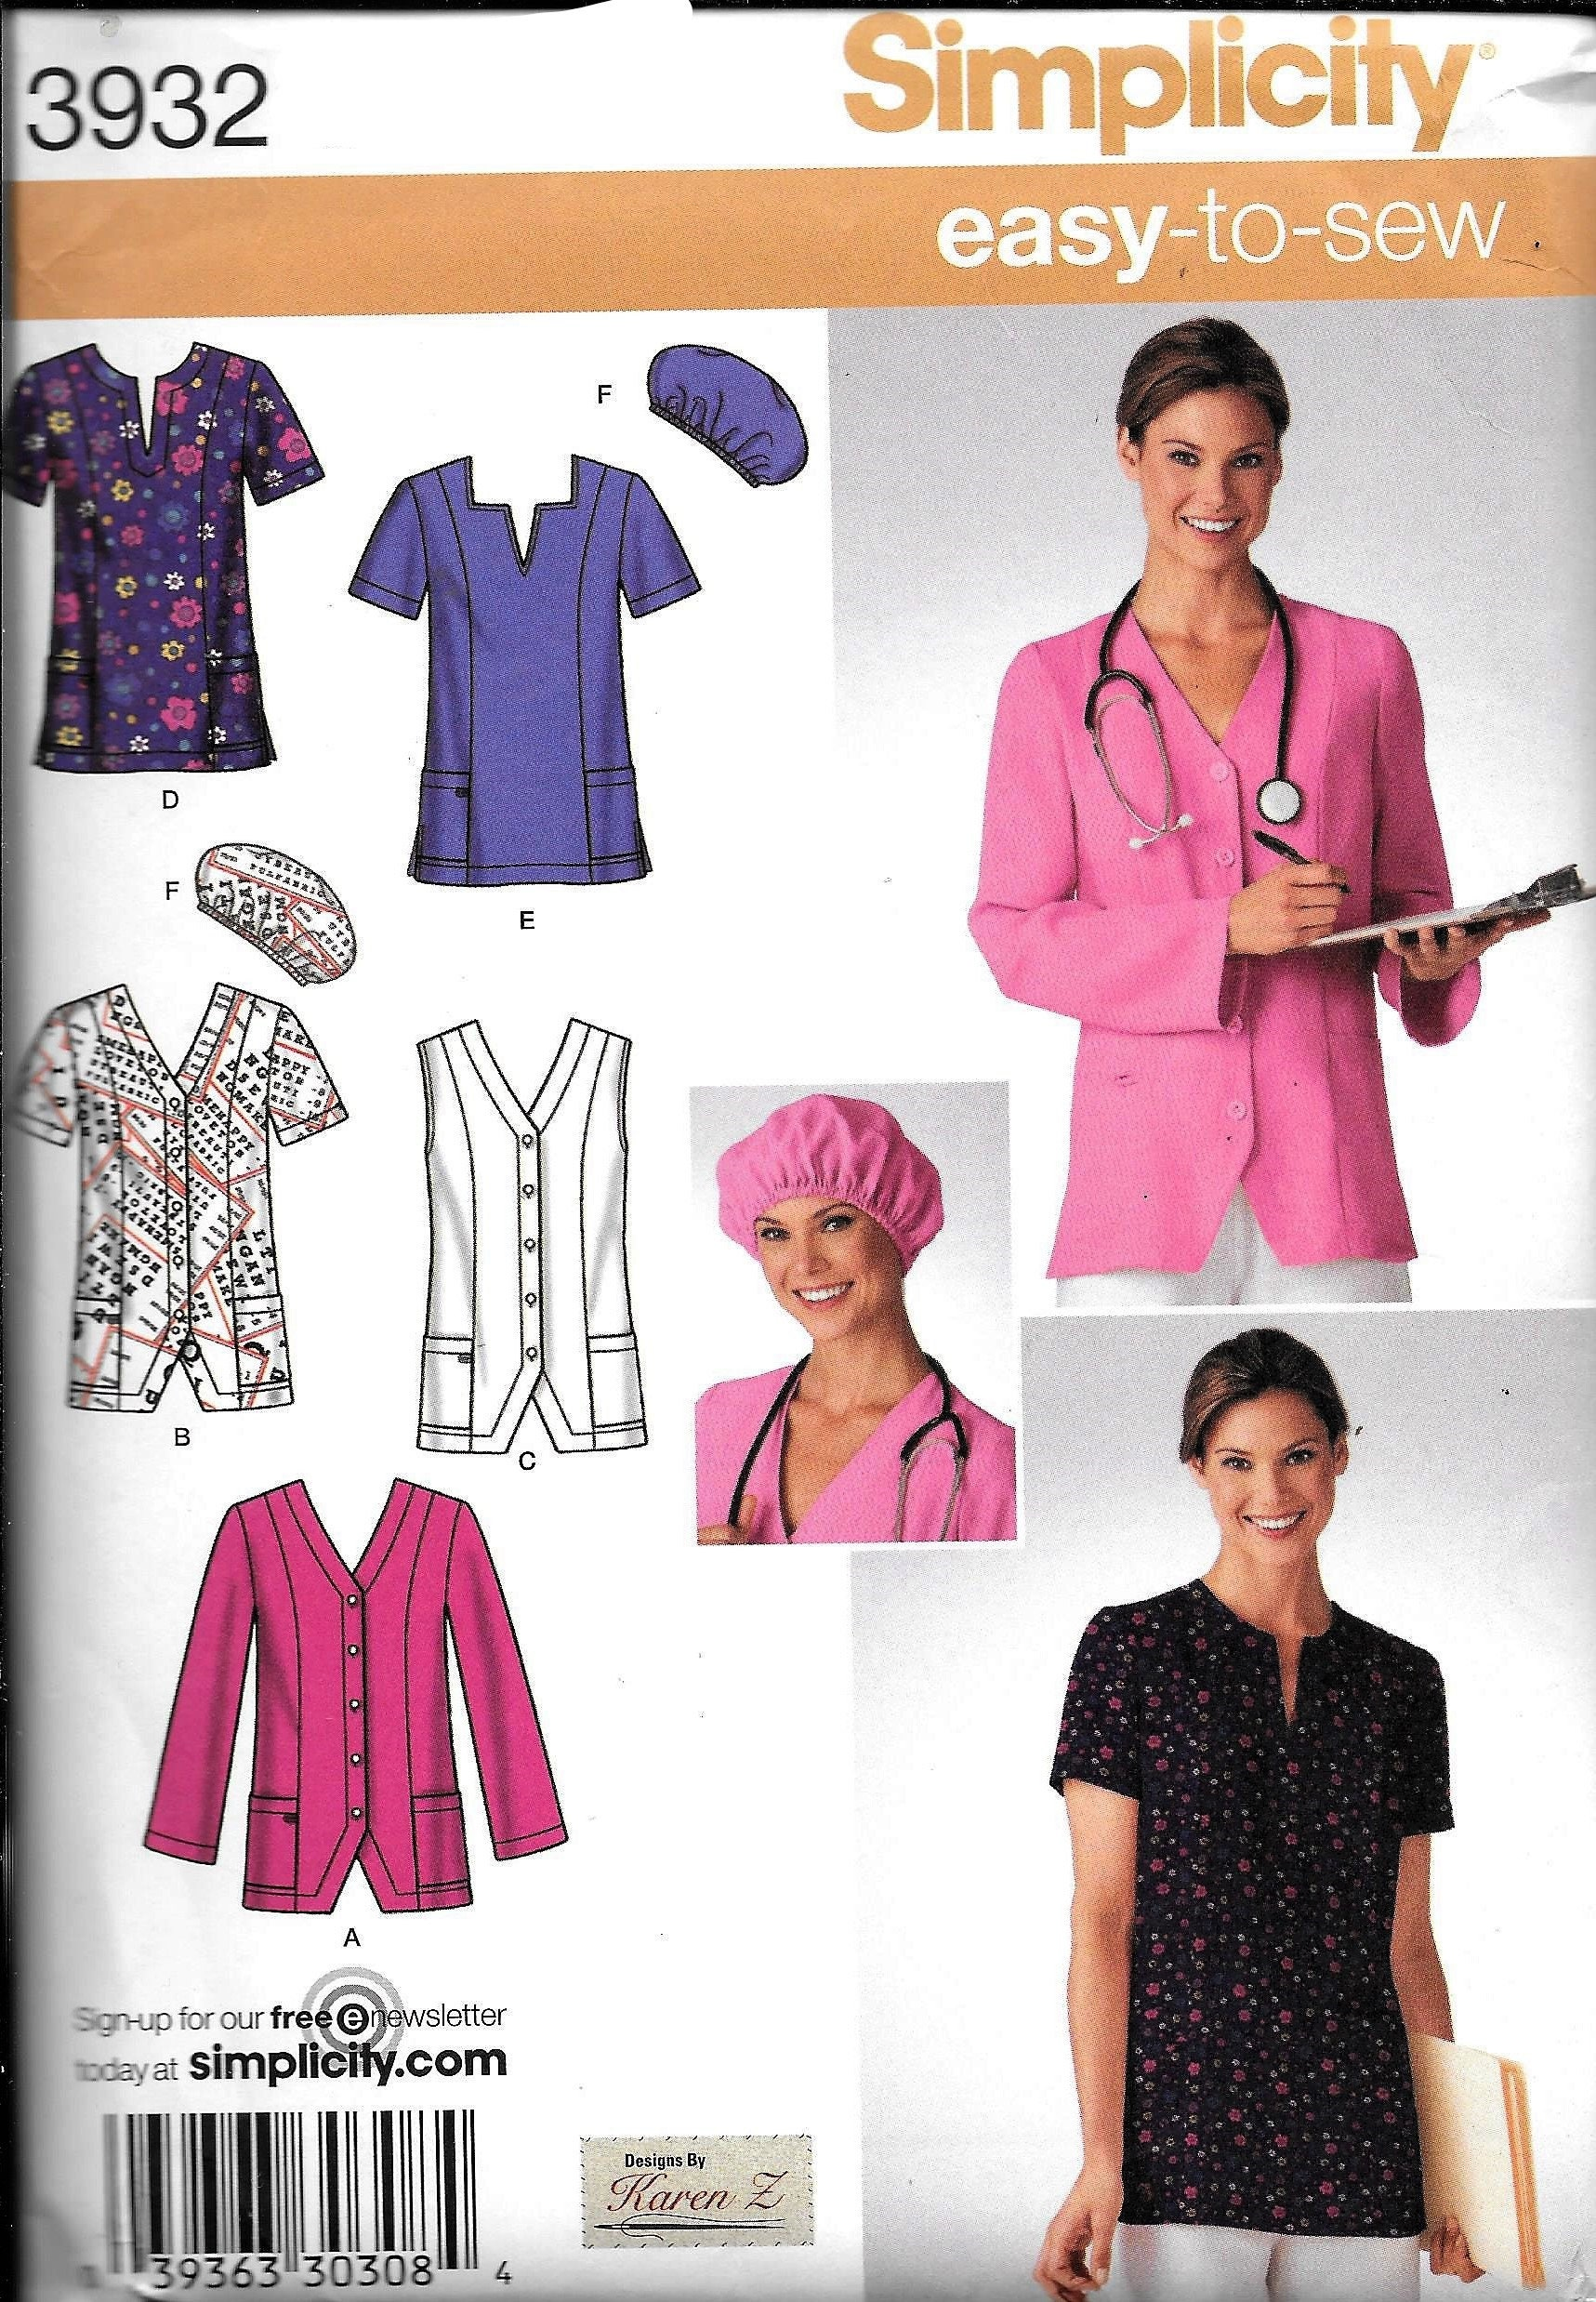 Simplicity 3932 Easy To Sew Scrubs Uniform Top Pants  fe0766e3eac